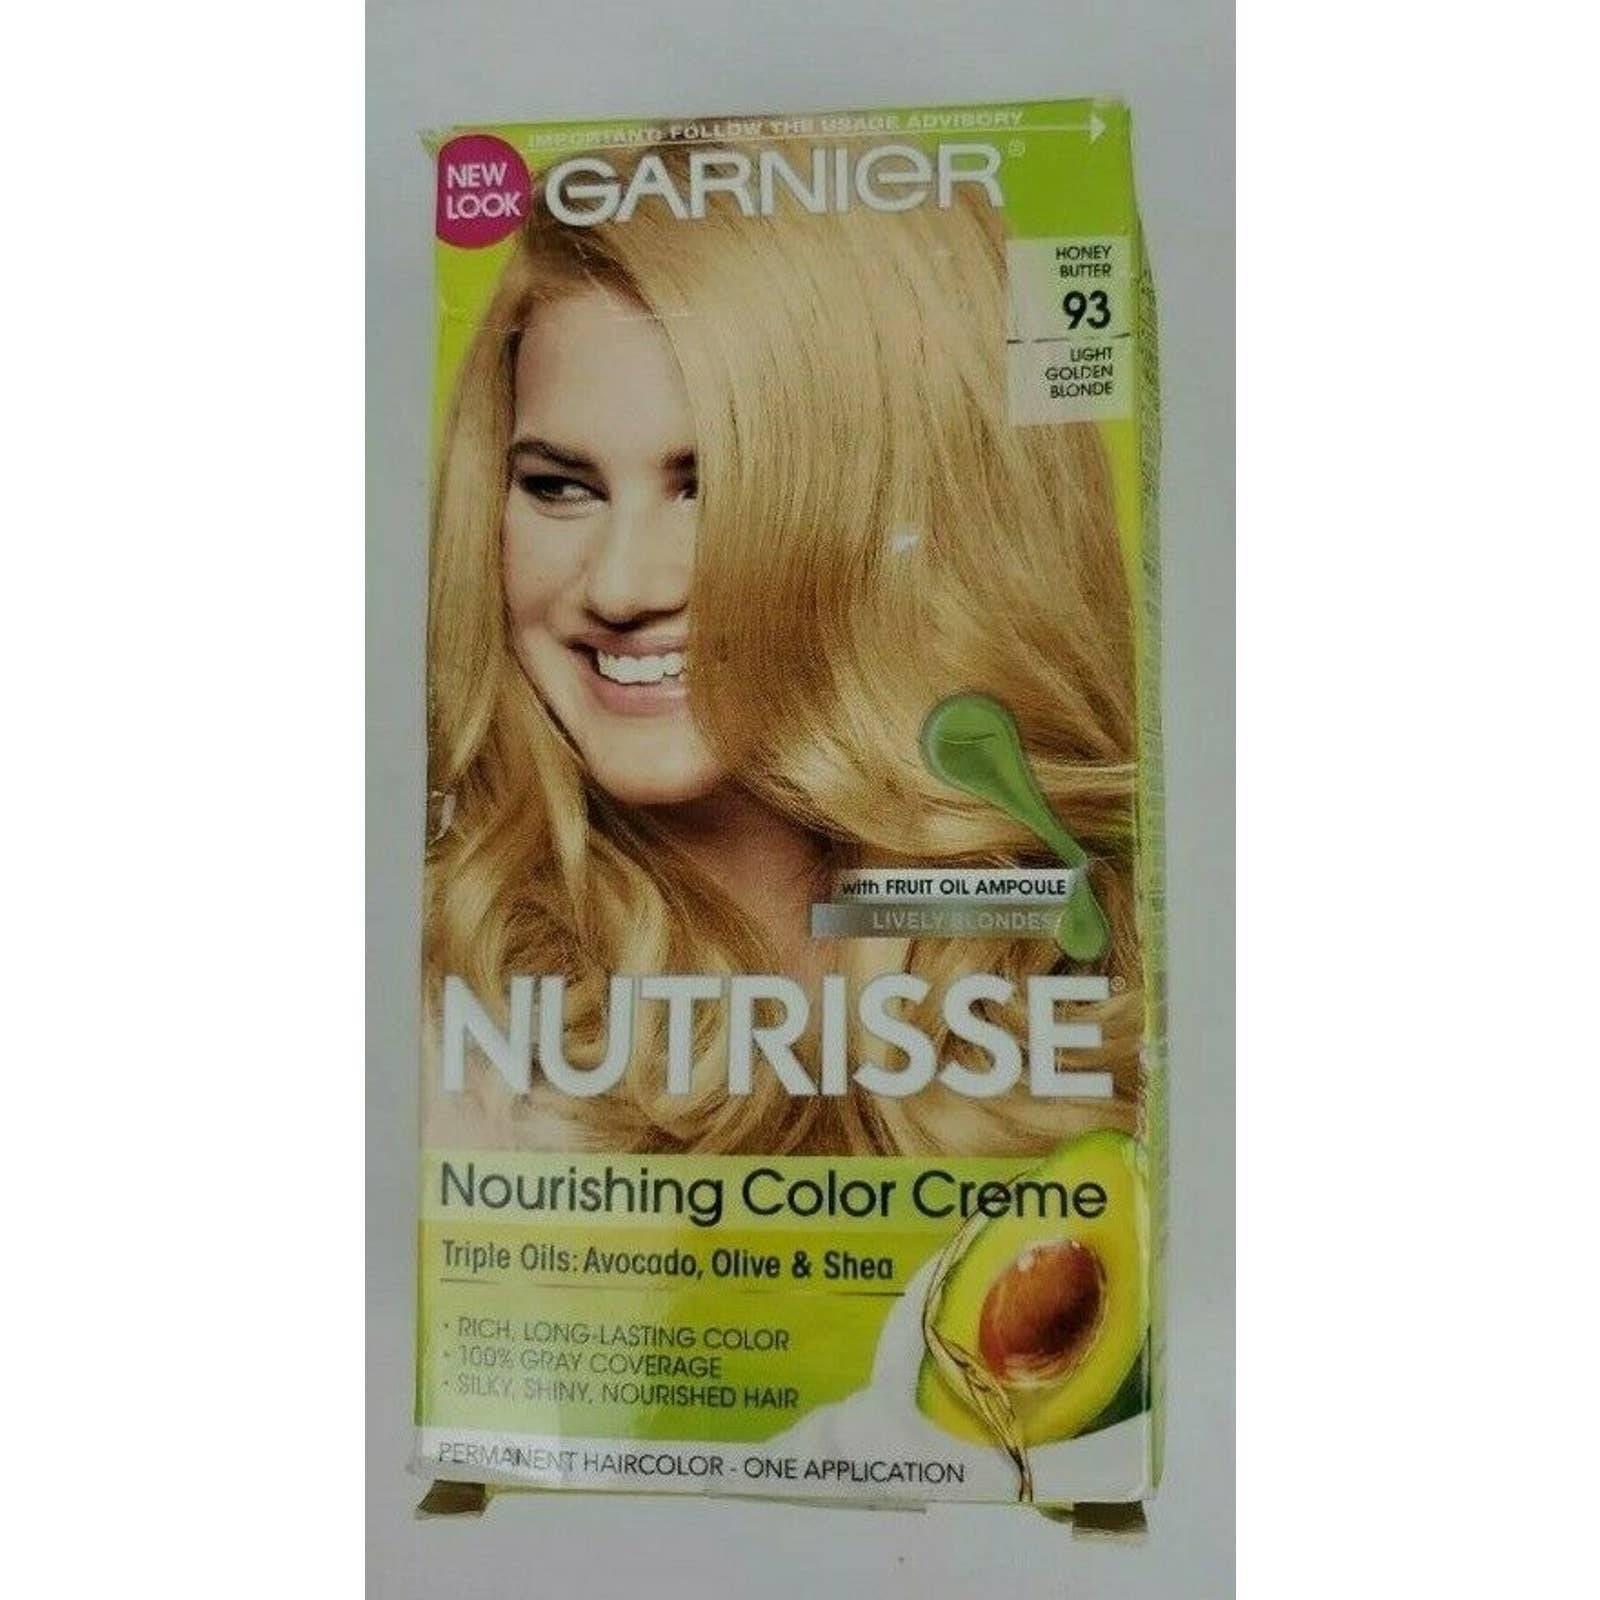 Garnier Nutrisse Nourishing Hair Color